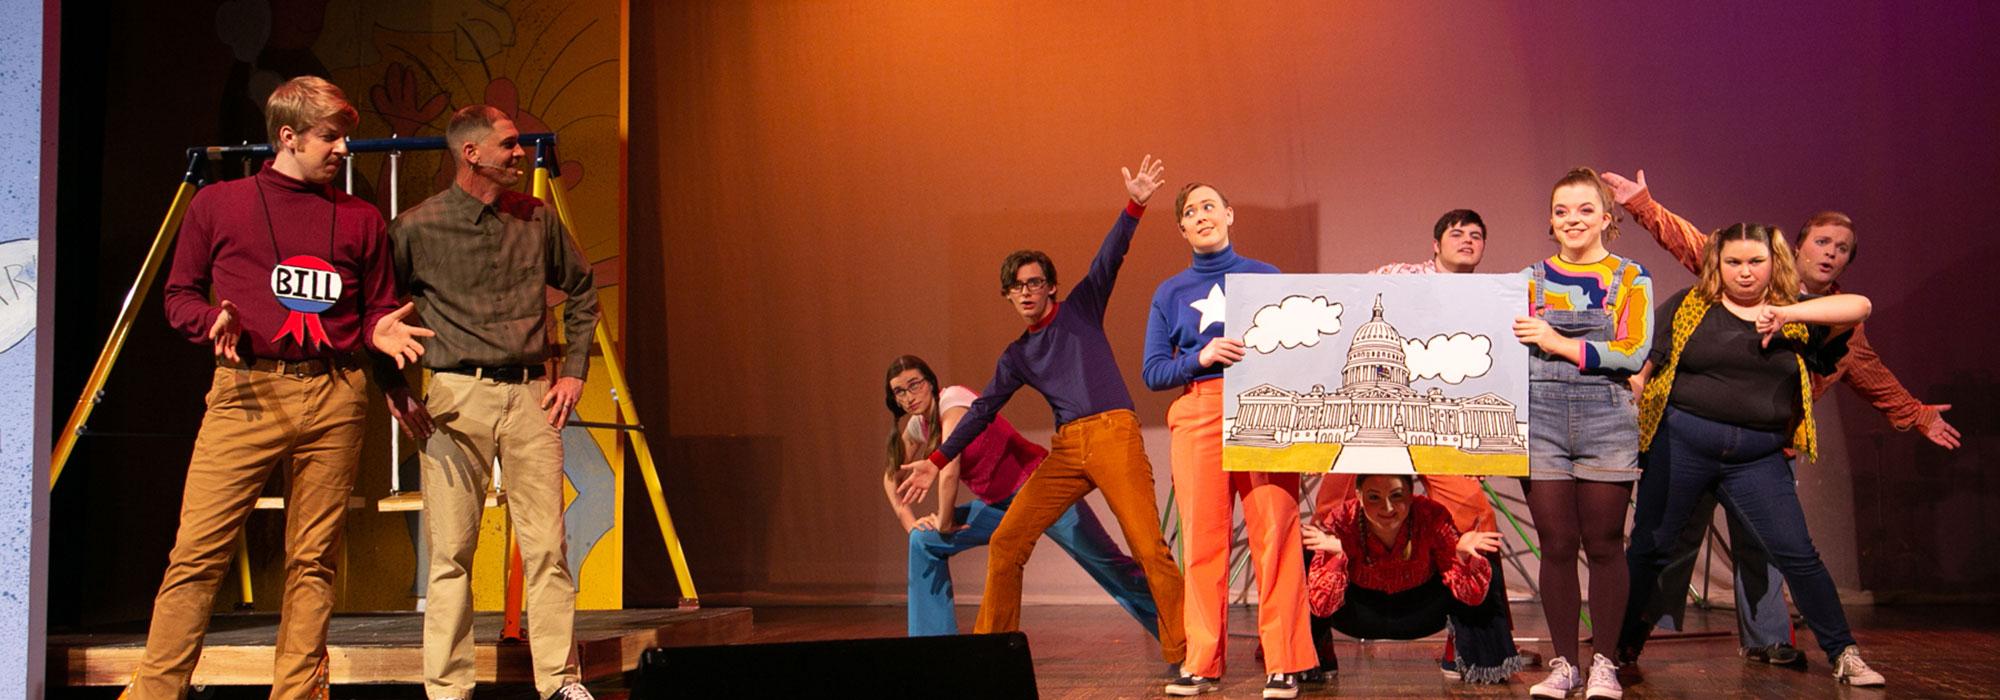 Student Actors performing Schoolhouse Rock'